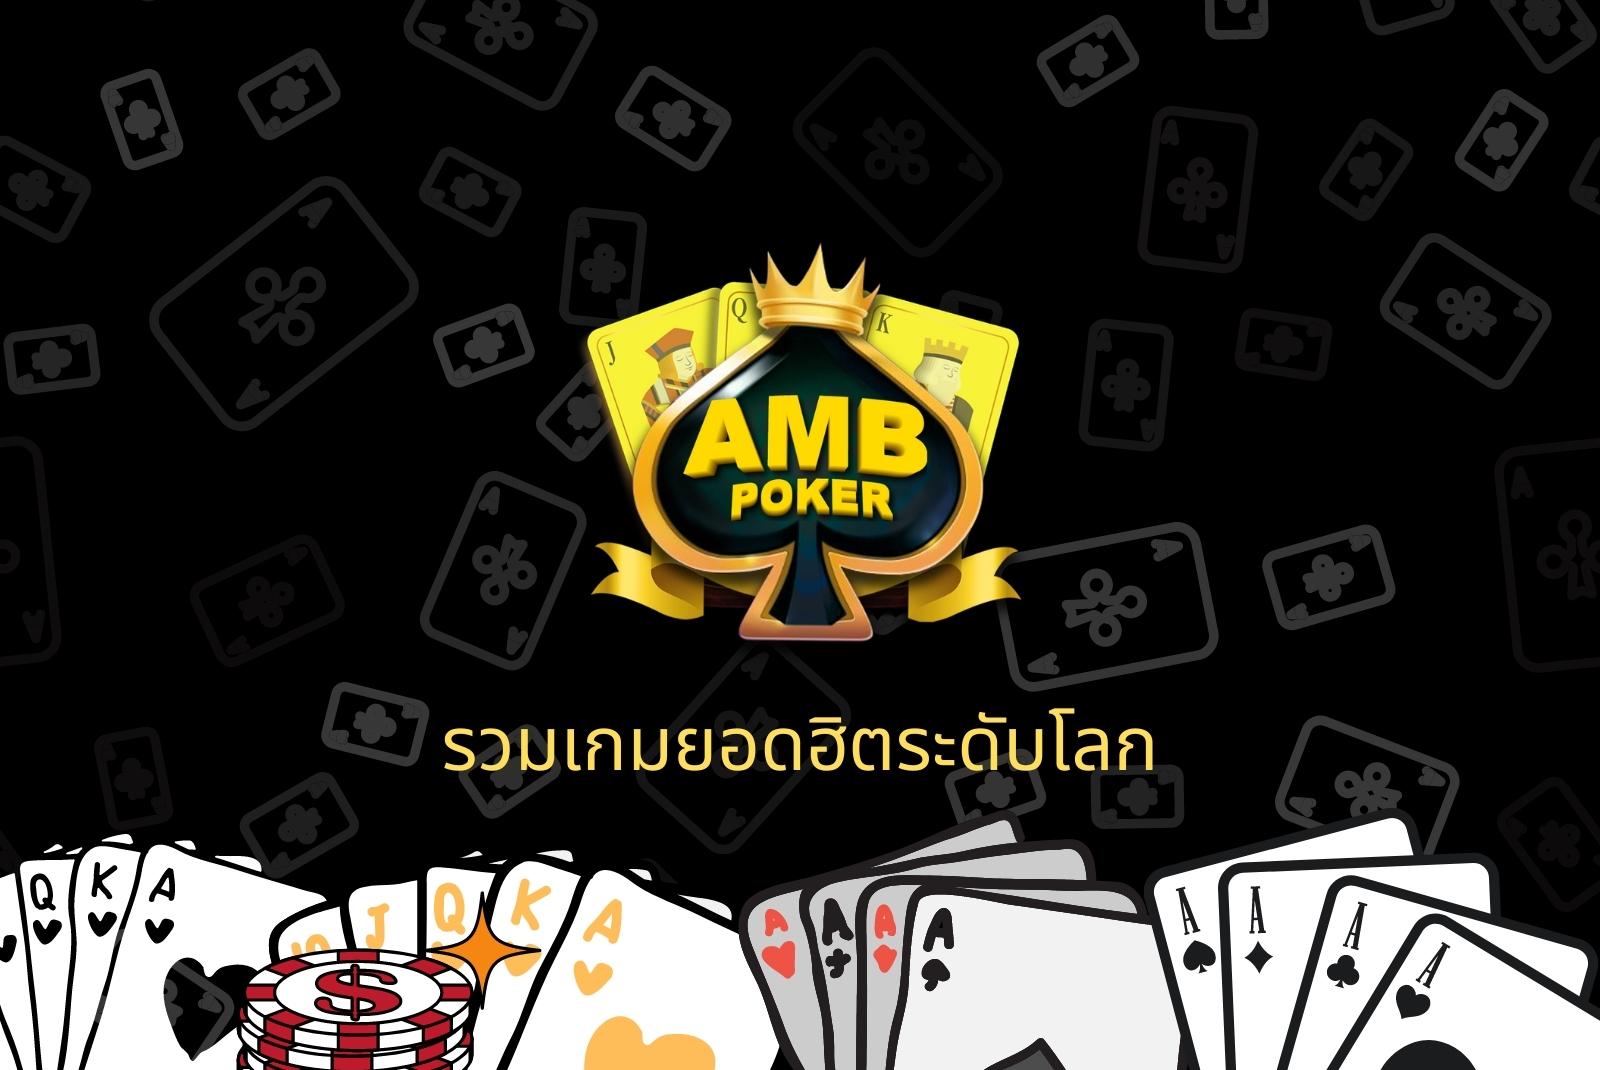 AMB Poker รวมเกมยอดฮิตระดับโลก